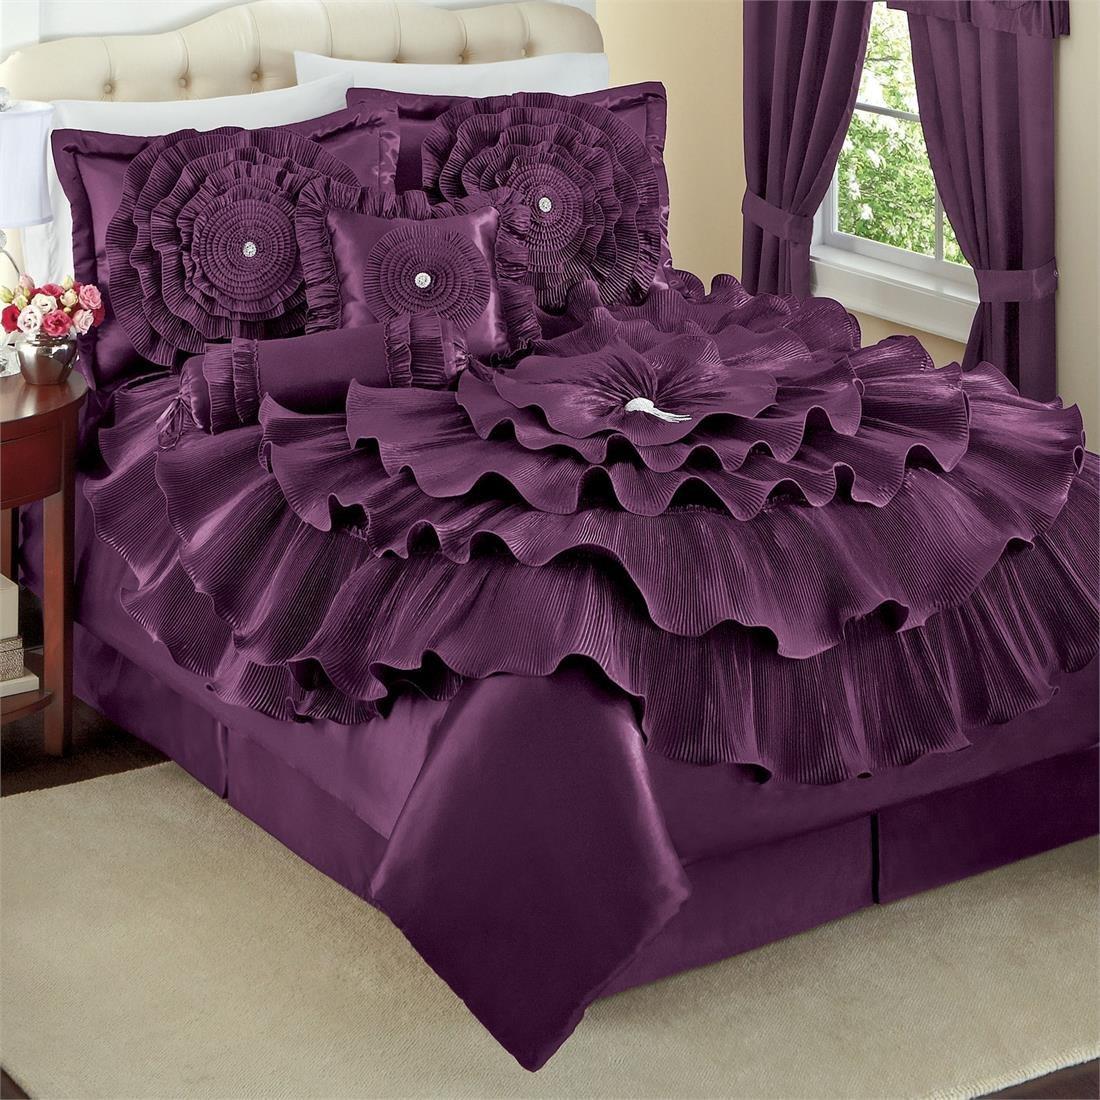 Total Fab: Deep Dark Purple Comforters & Bedding Sets